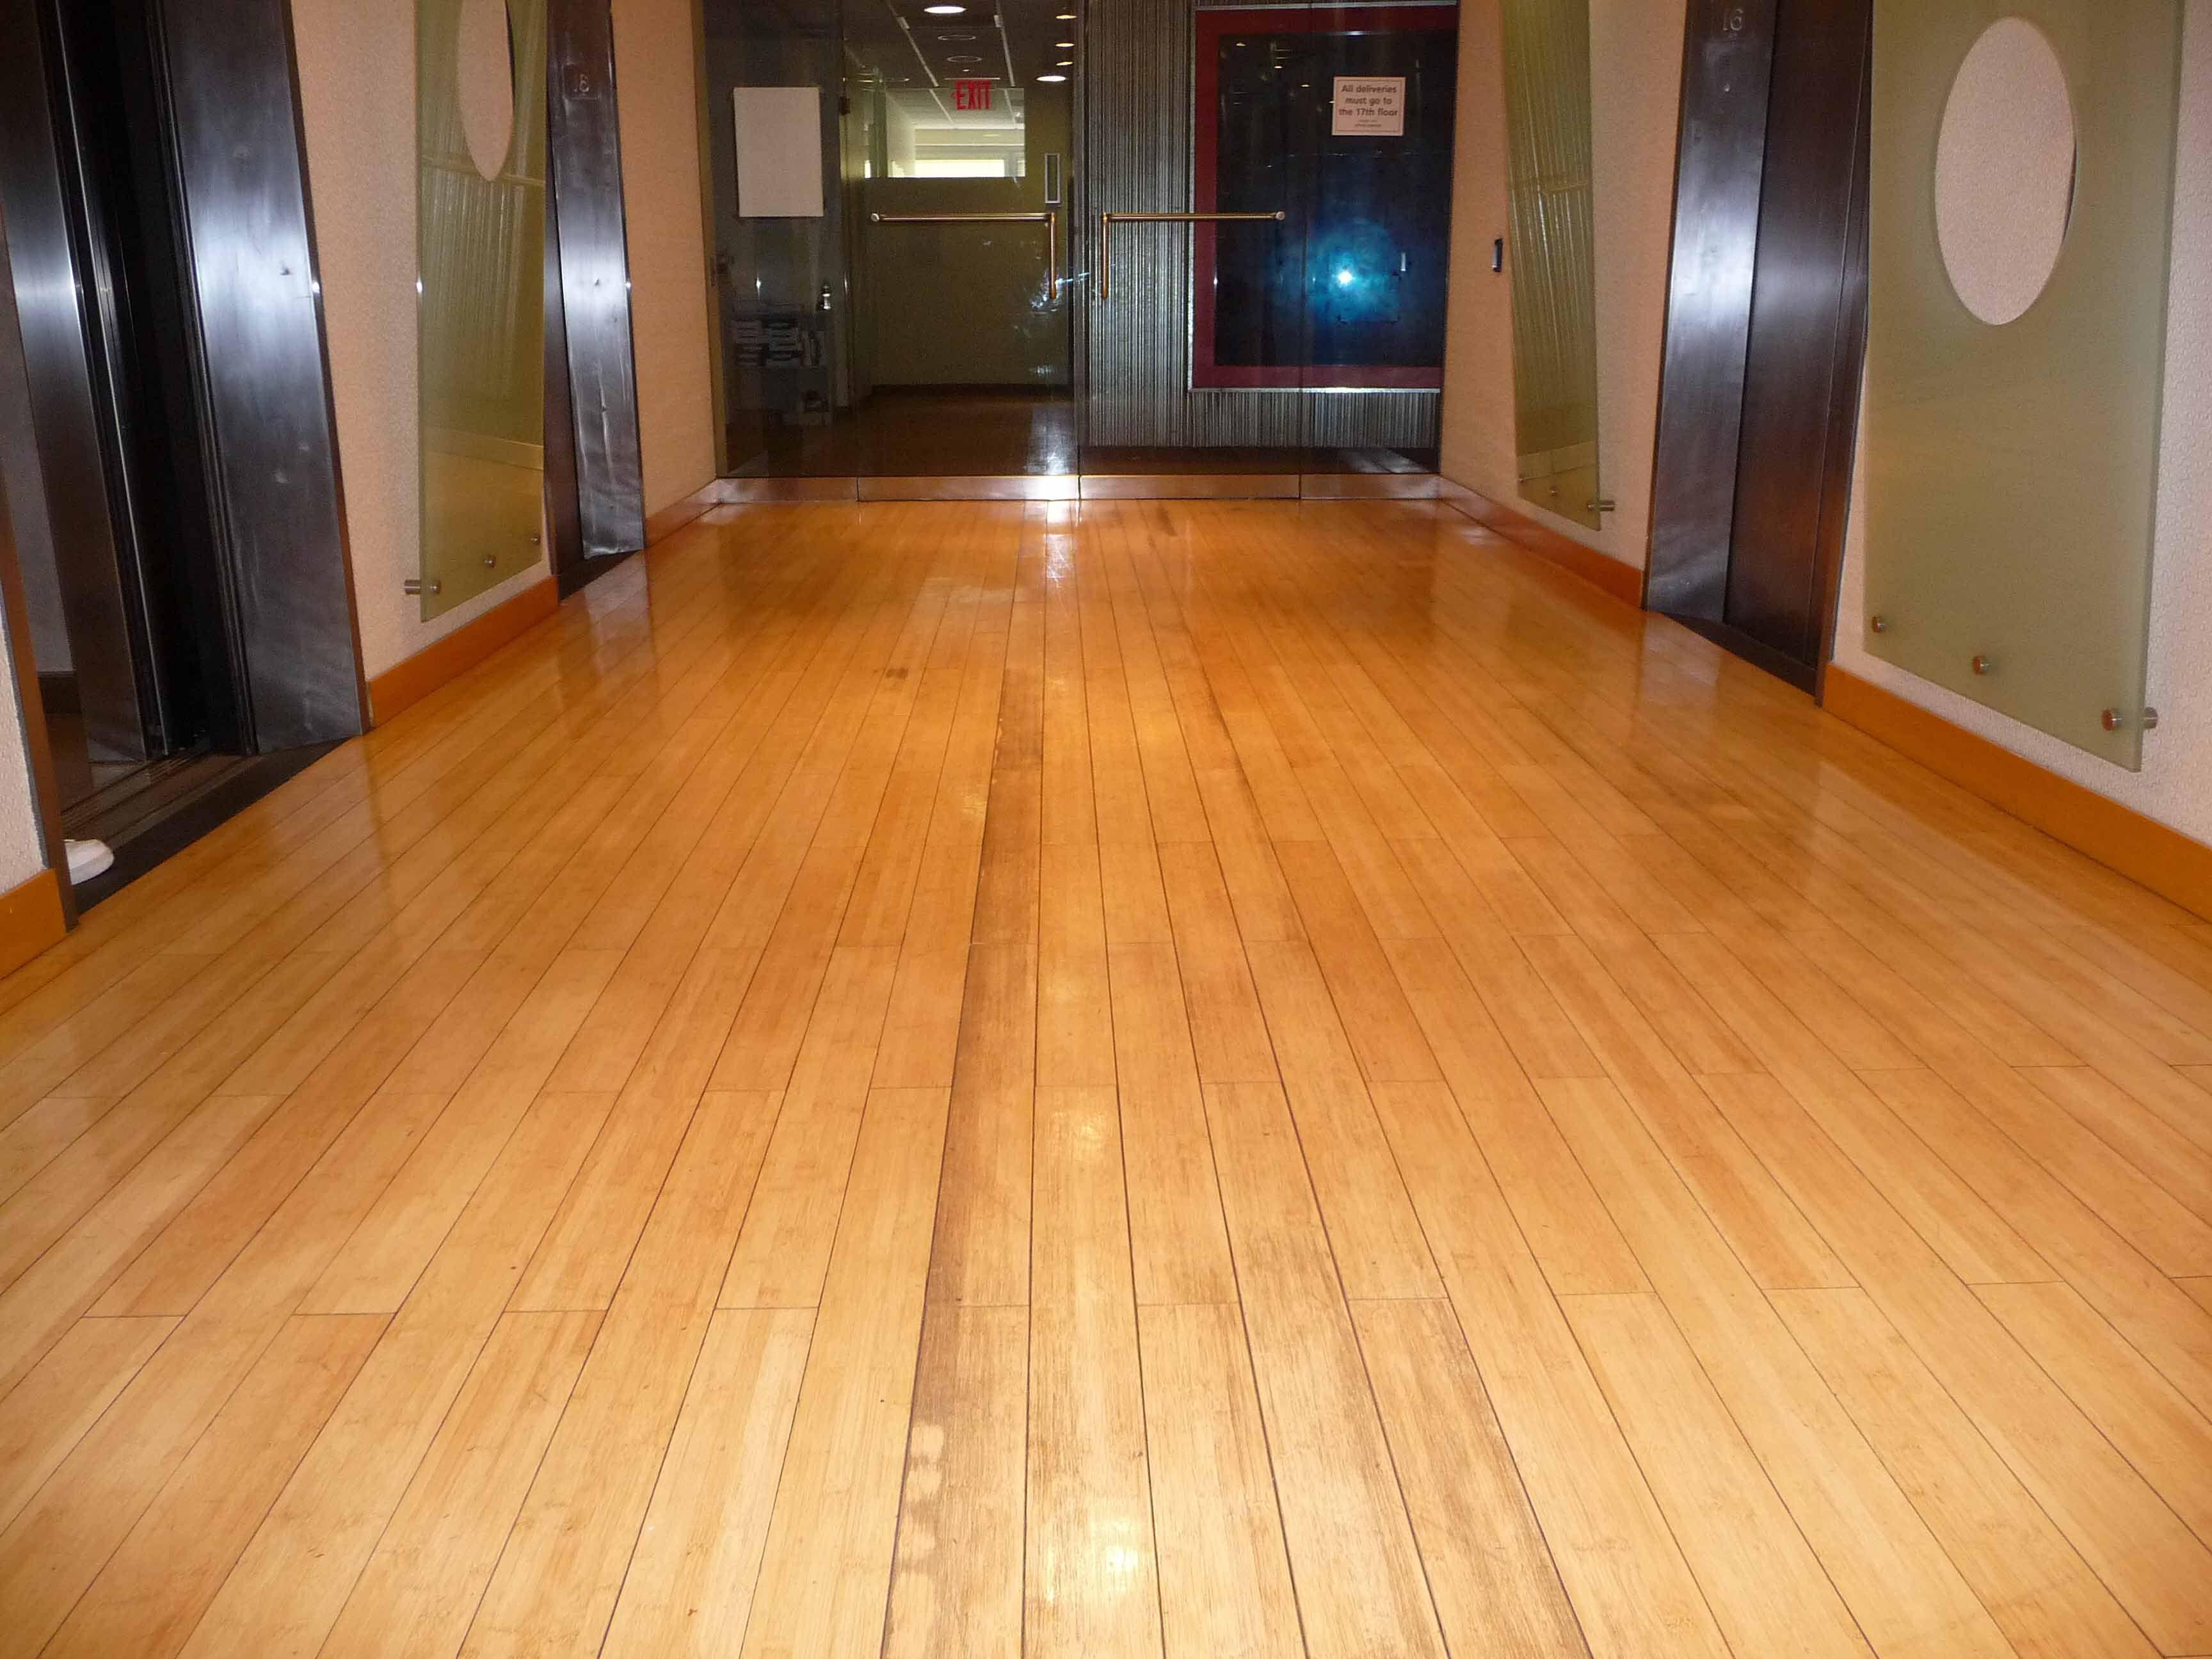 hardwood flooring company croydon Hardwood floors